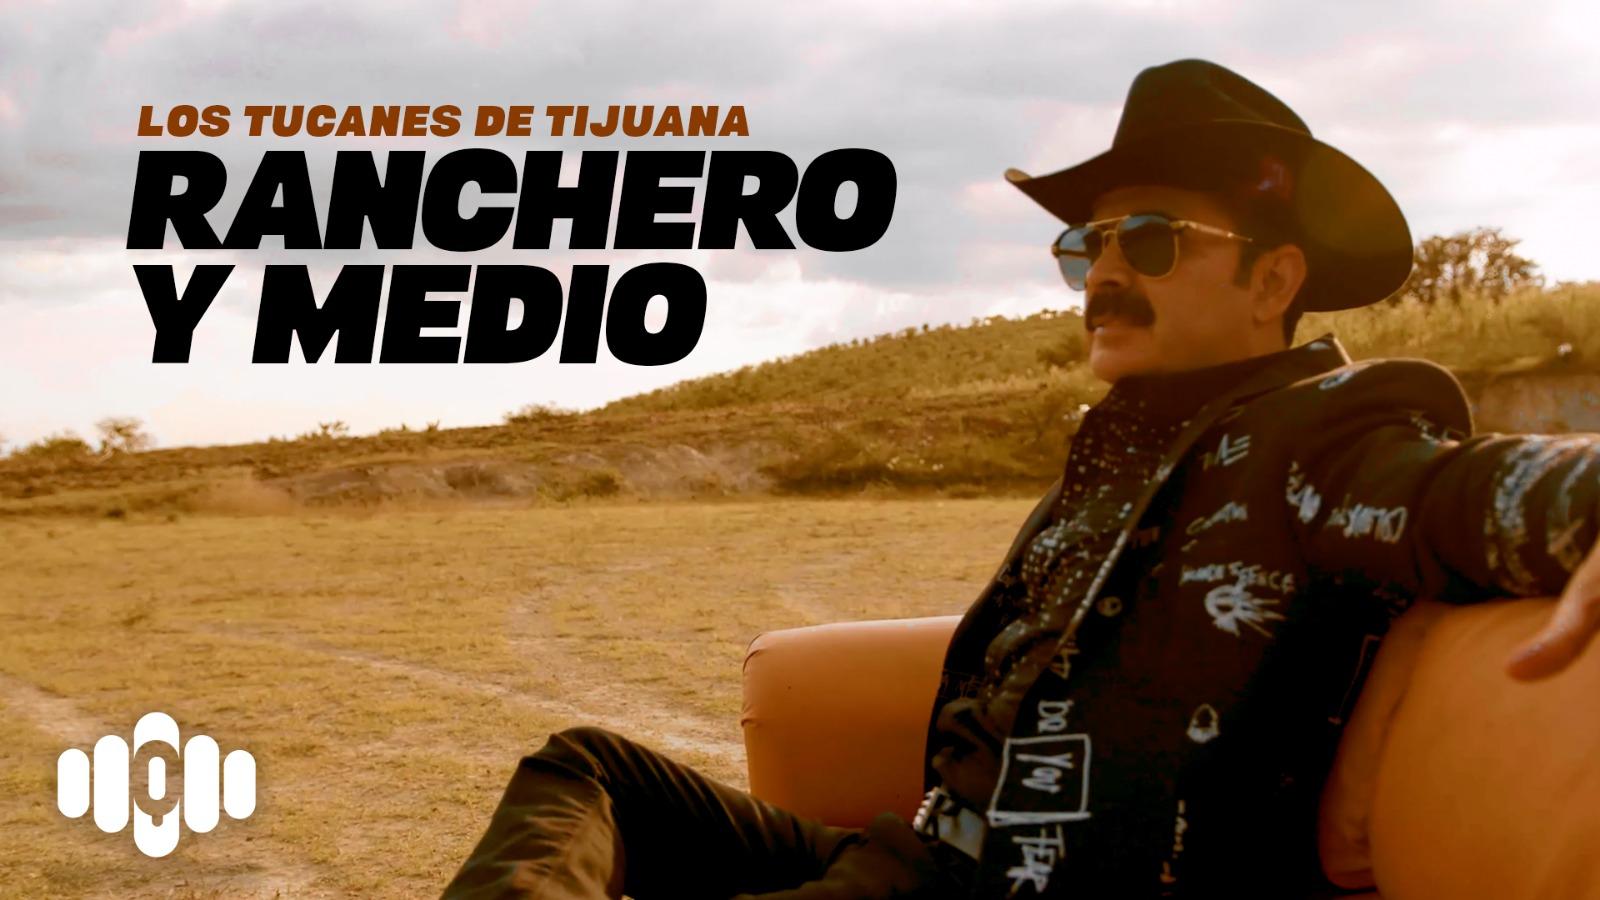 Ranchero y Medio -Telemundo & YouTube